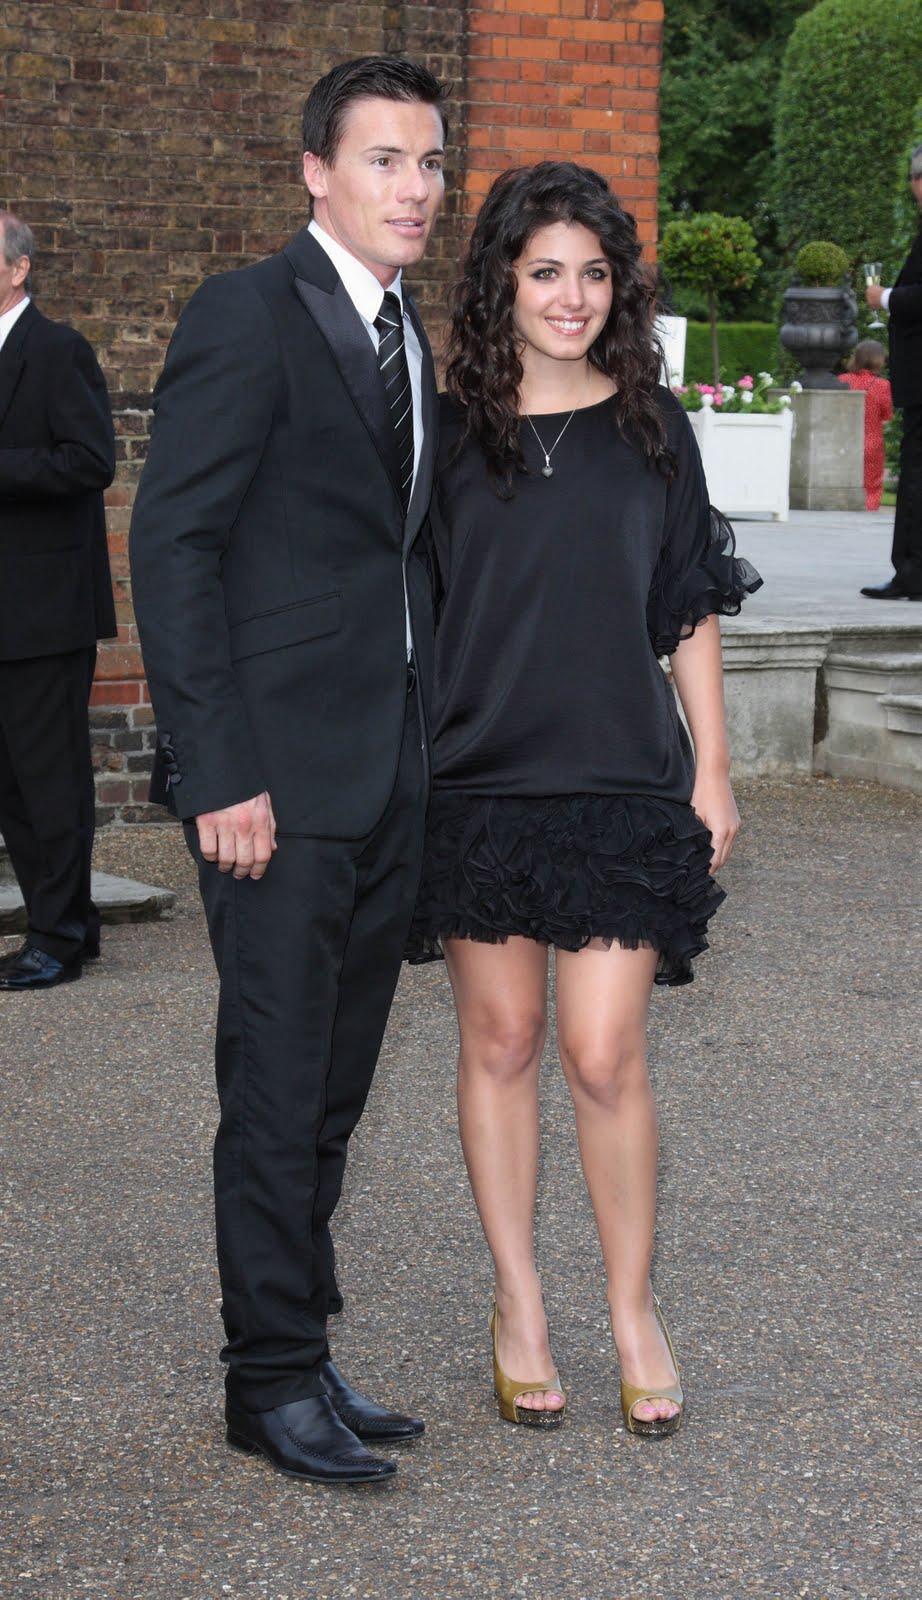 Katie Melua Flirty Black Dress At The Orangery Topaiditisplateias